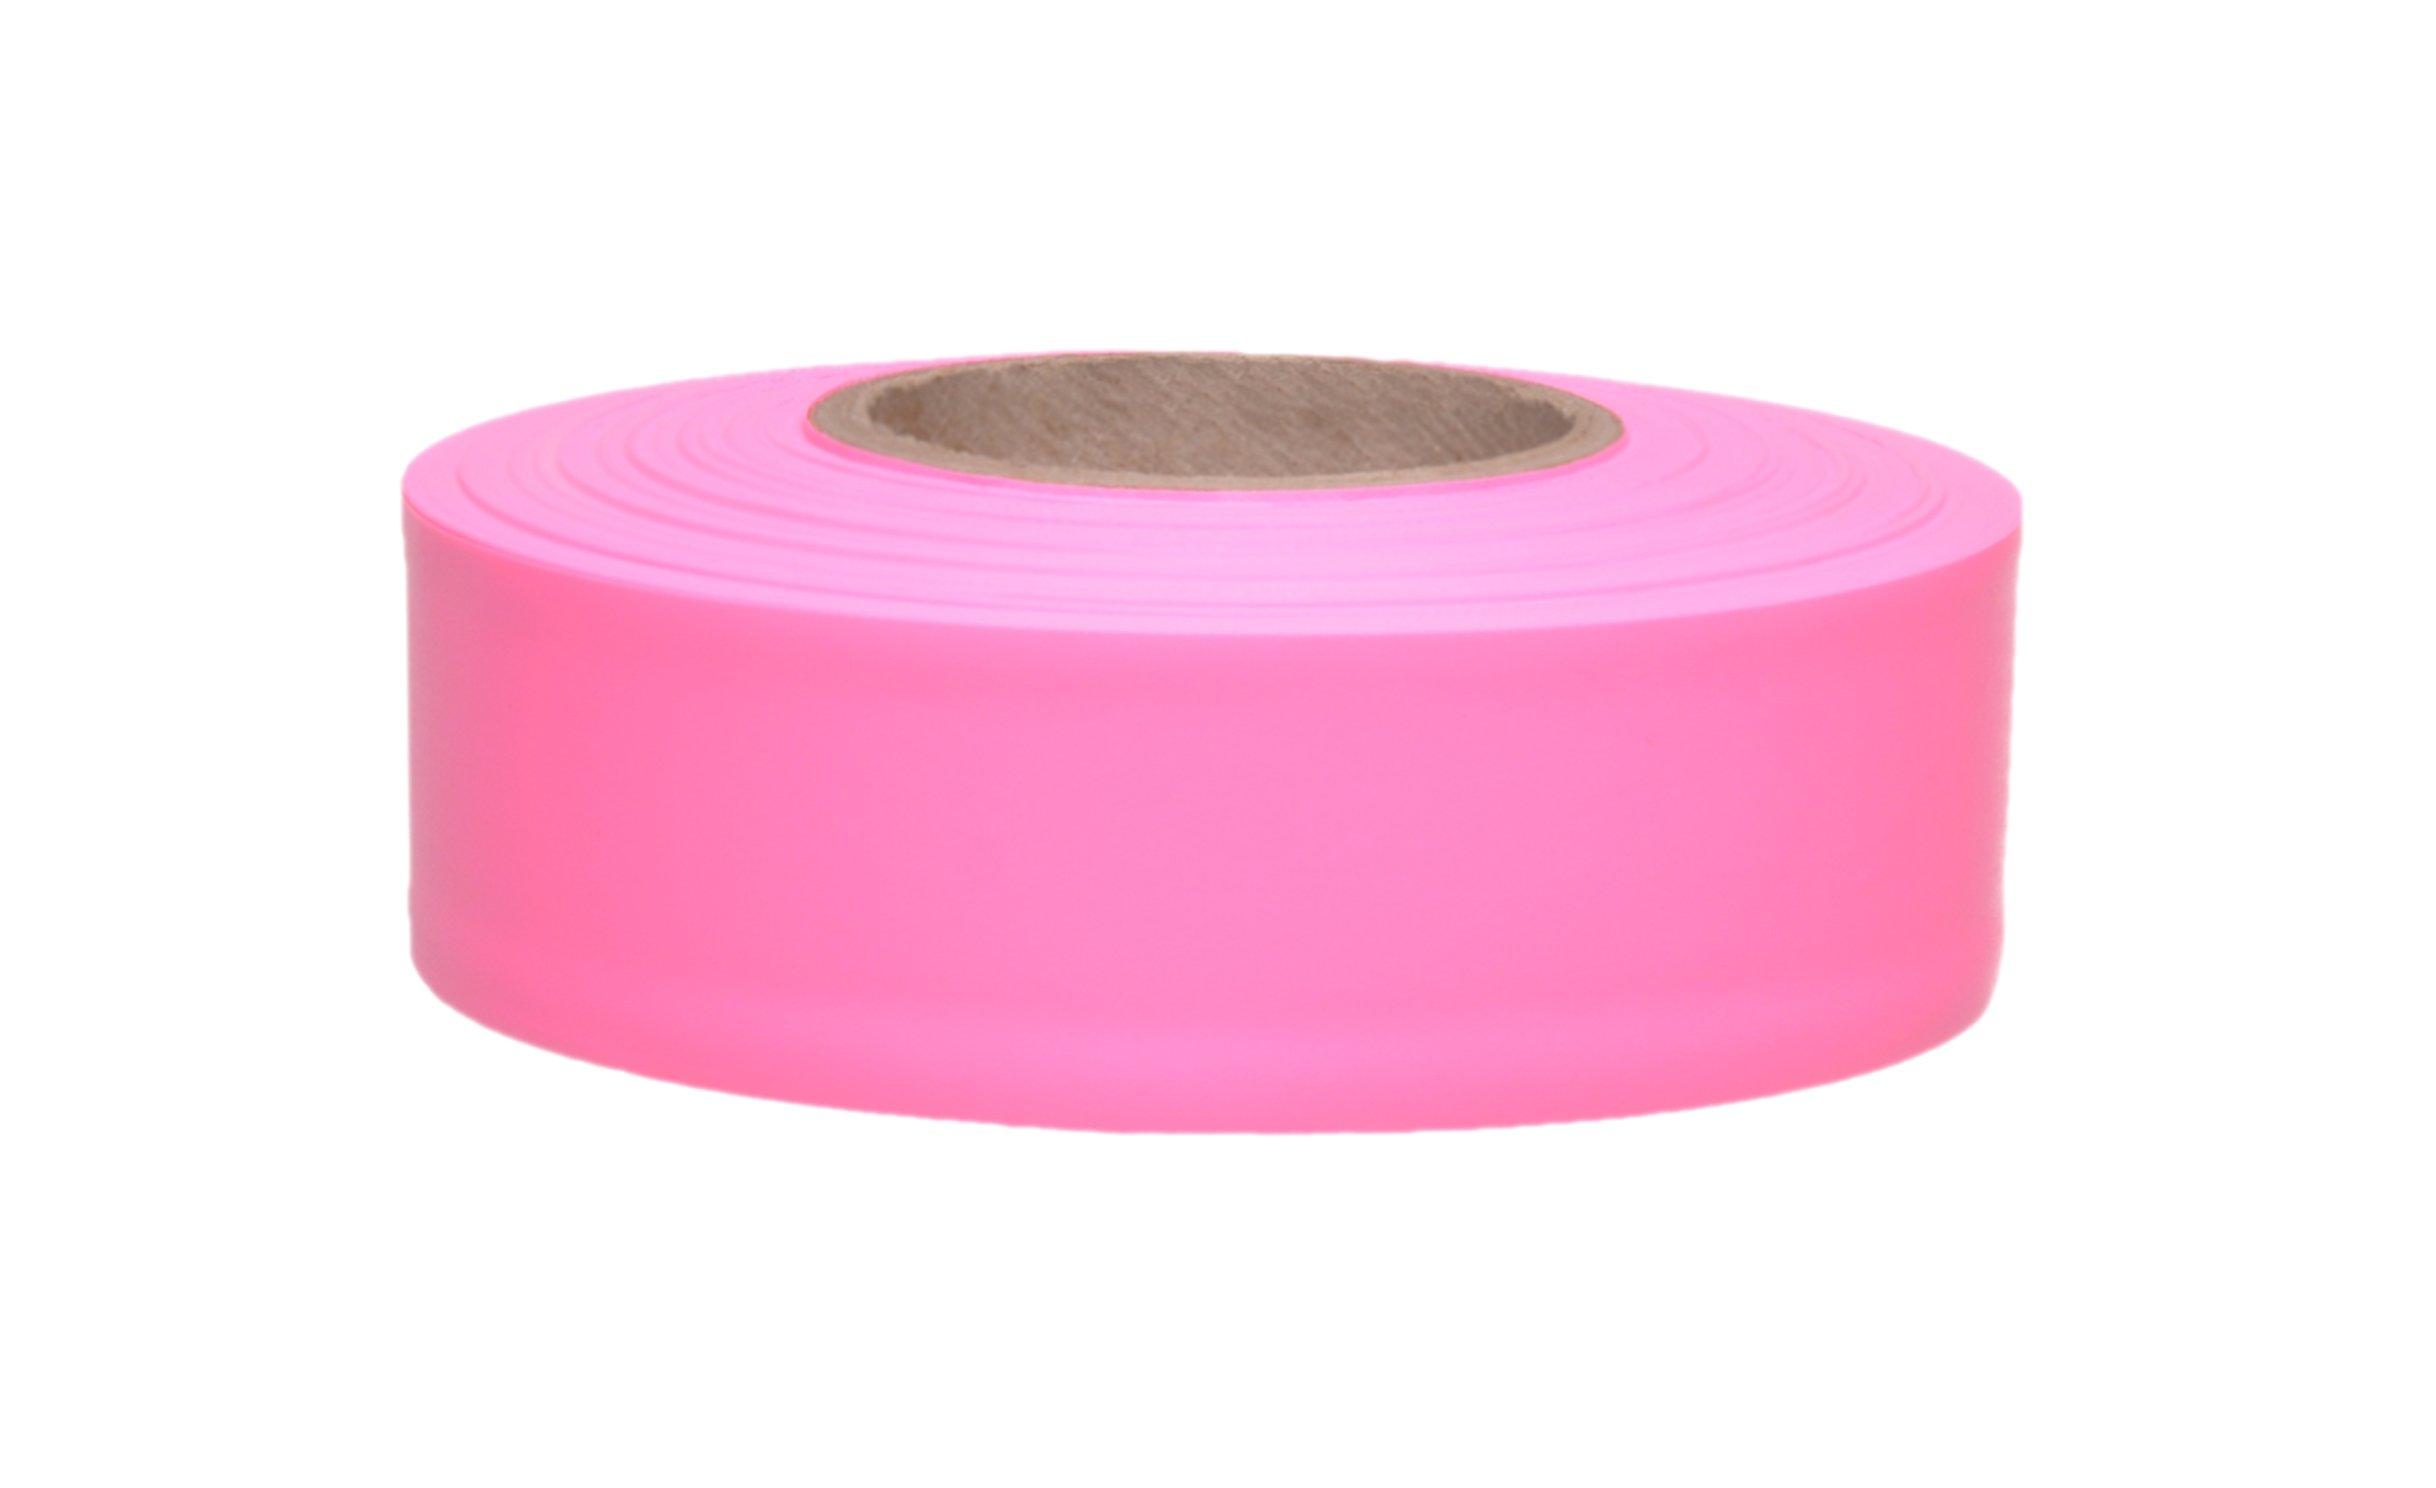 Presco TFPG-658 150' Length x 1-3/16'' Width, PVC Film, Taffeta Pink Glo Solid Color Roll Flagging (Pack of 144)